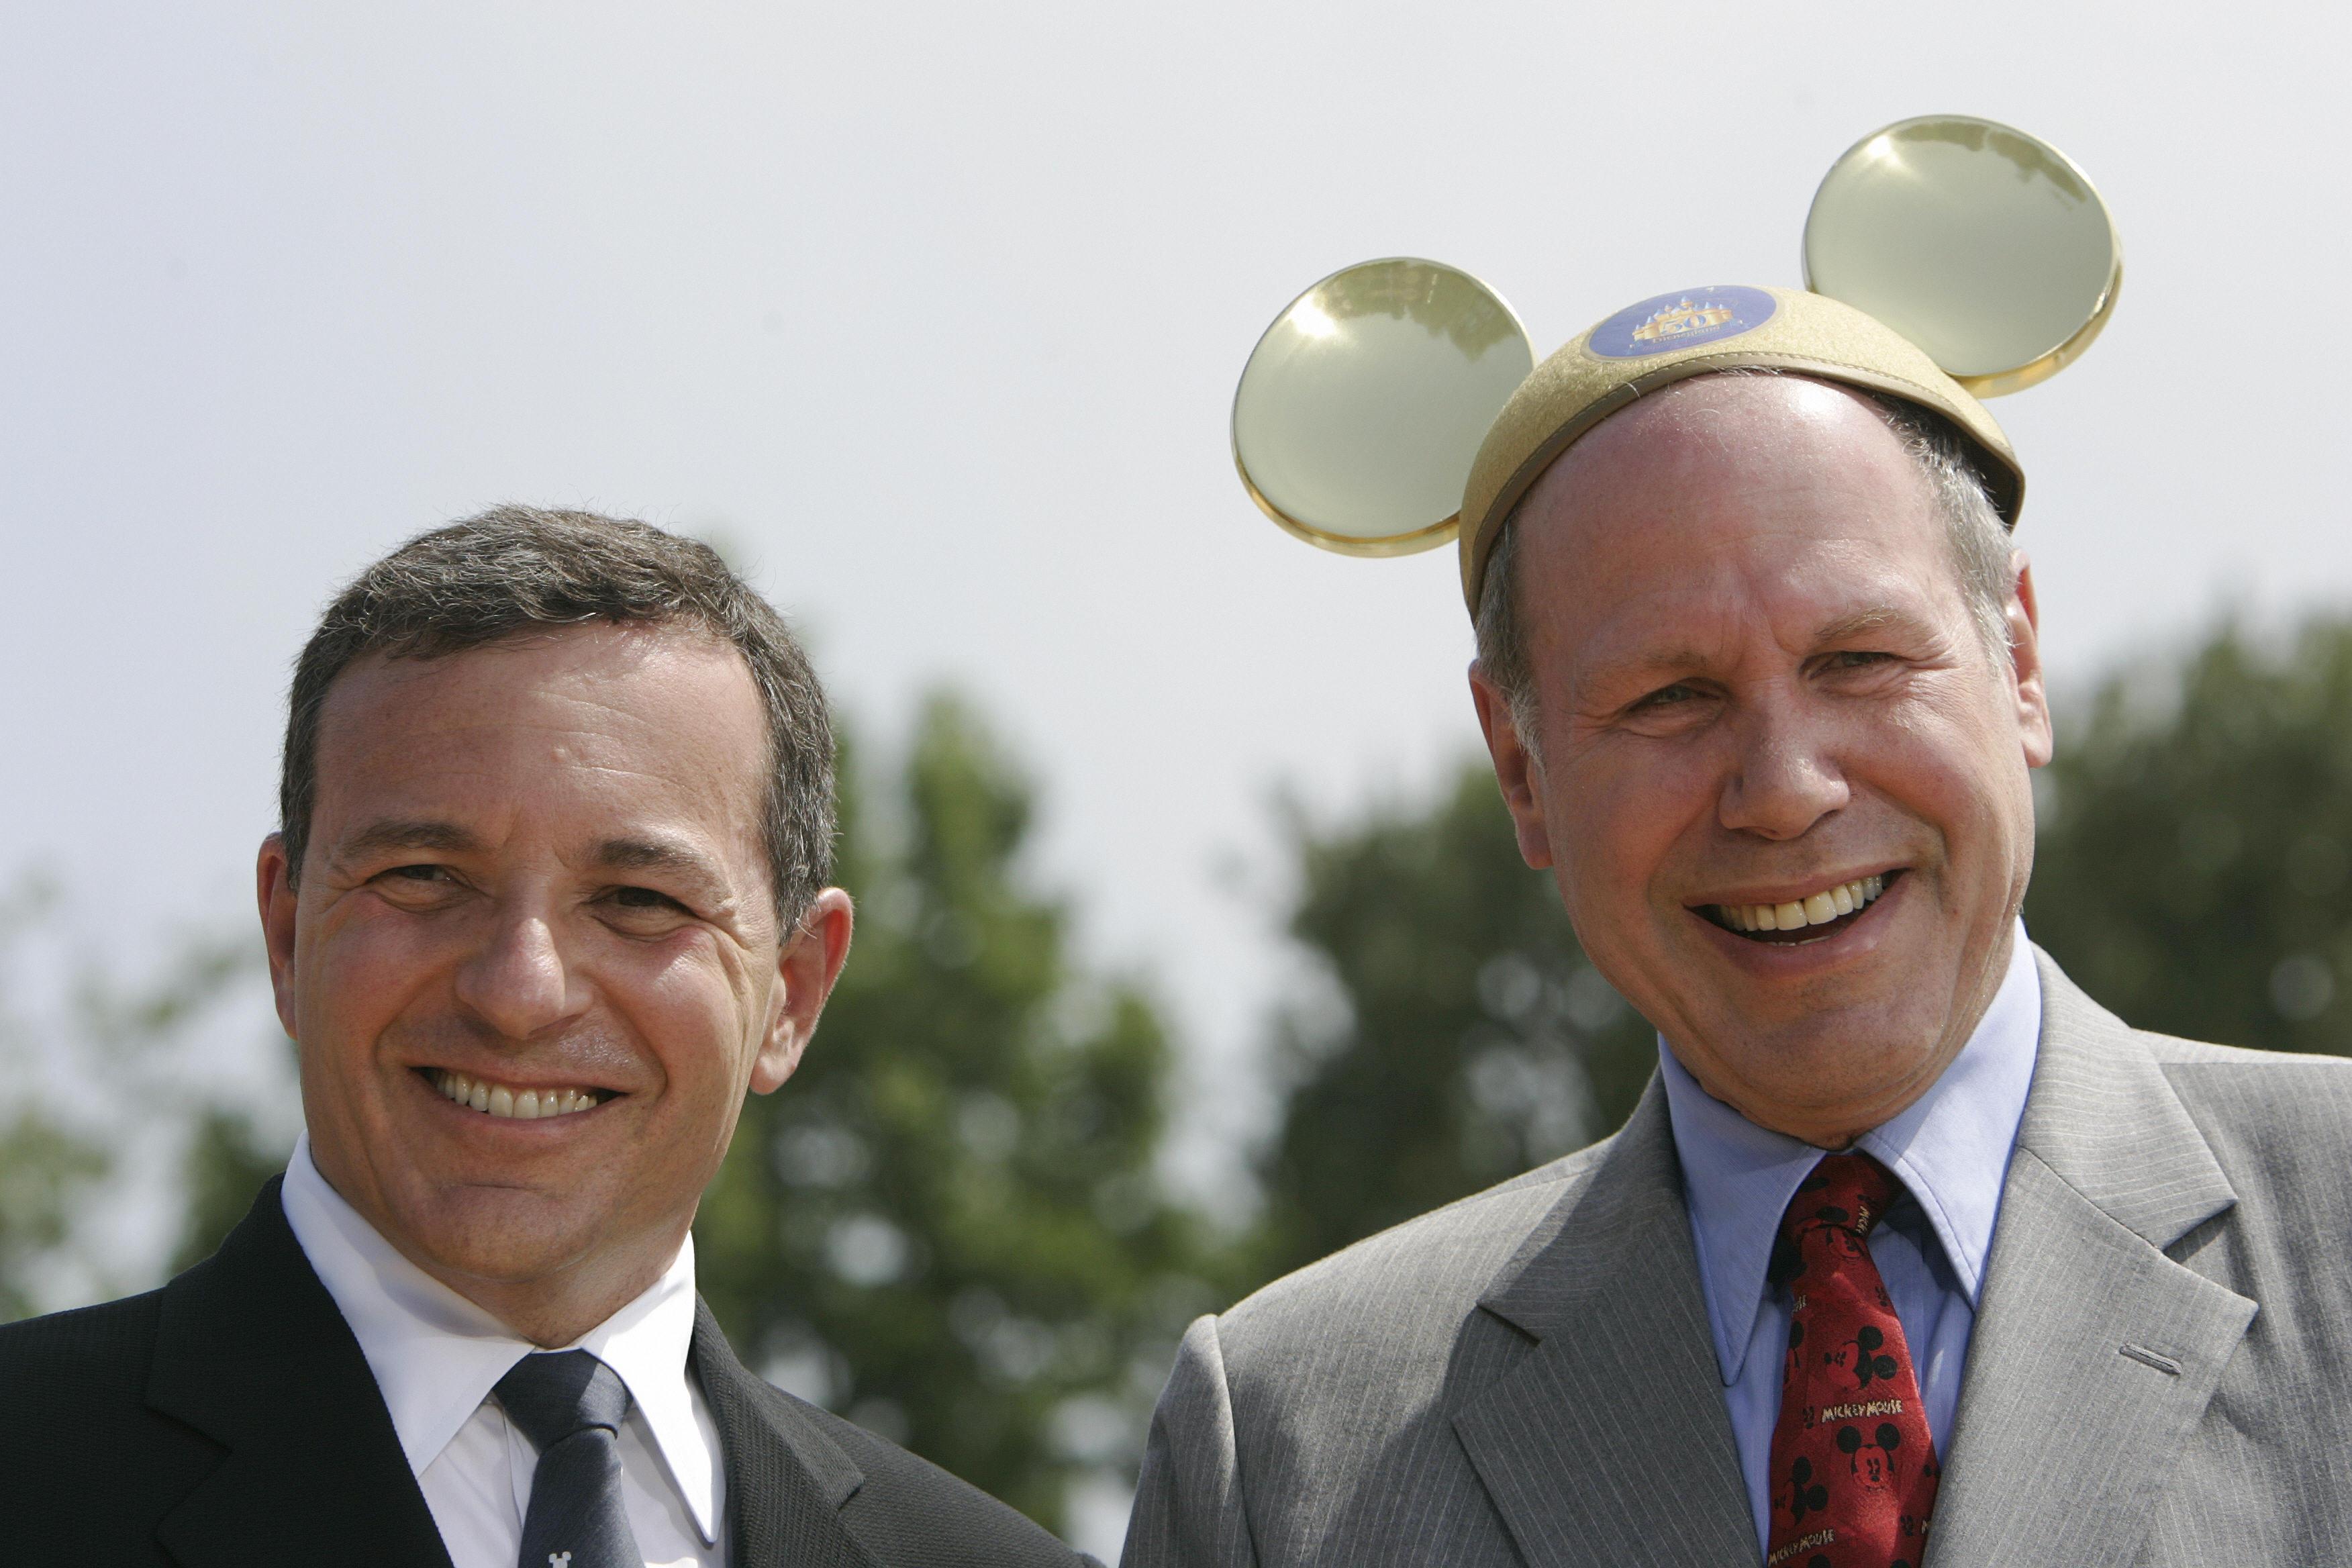 Disney CEO Michael Eisner